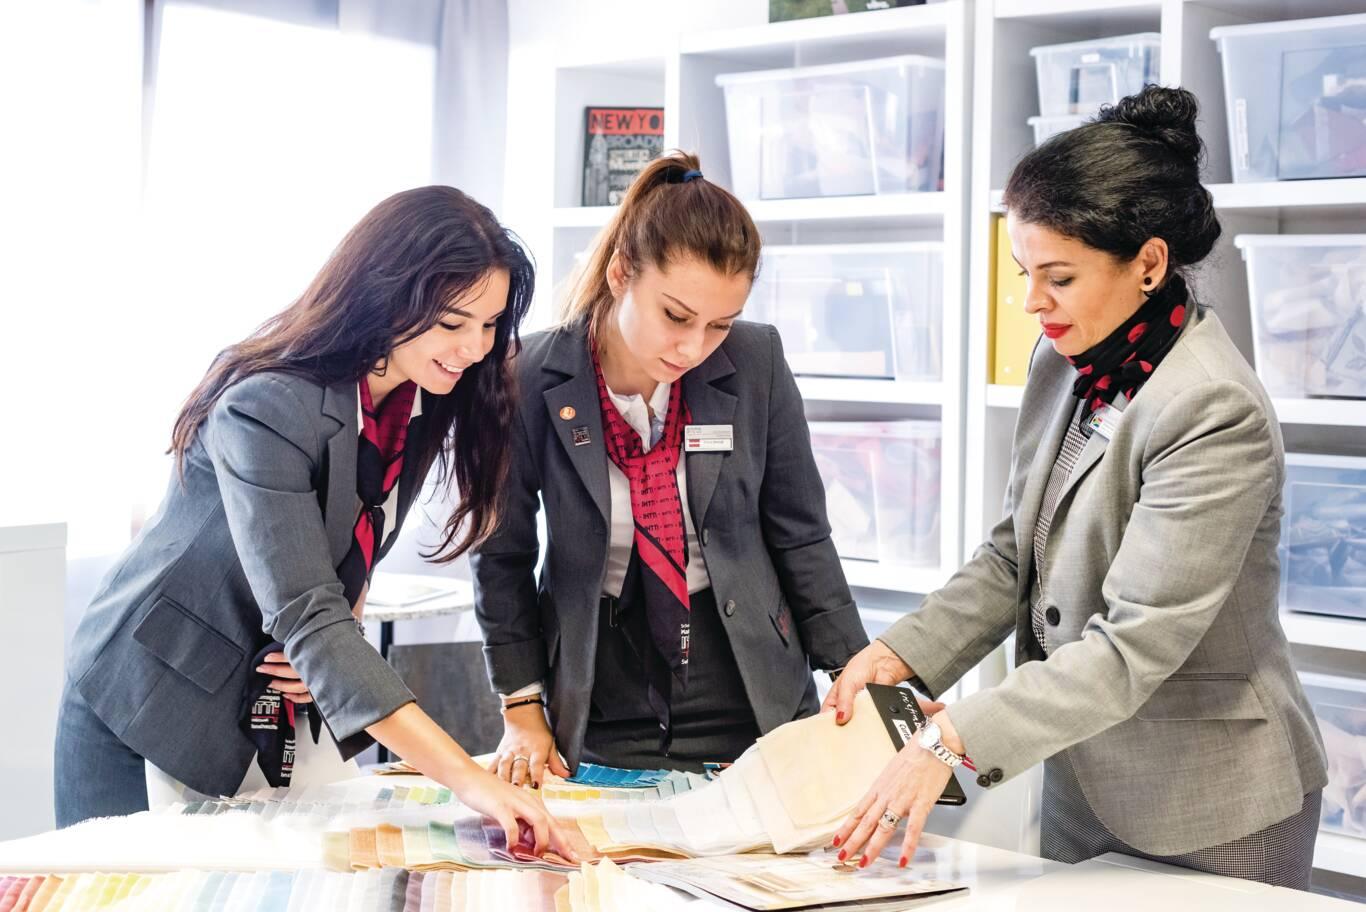 Hotel and Design Management - Bachelorutdannelse 1